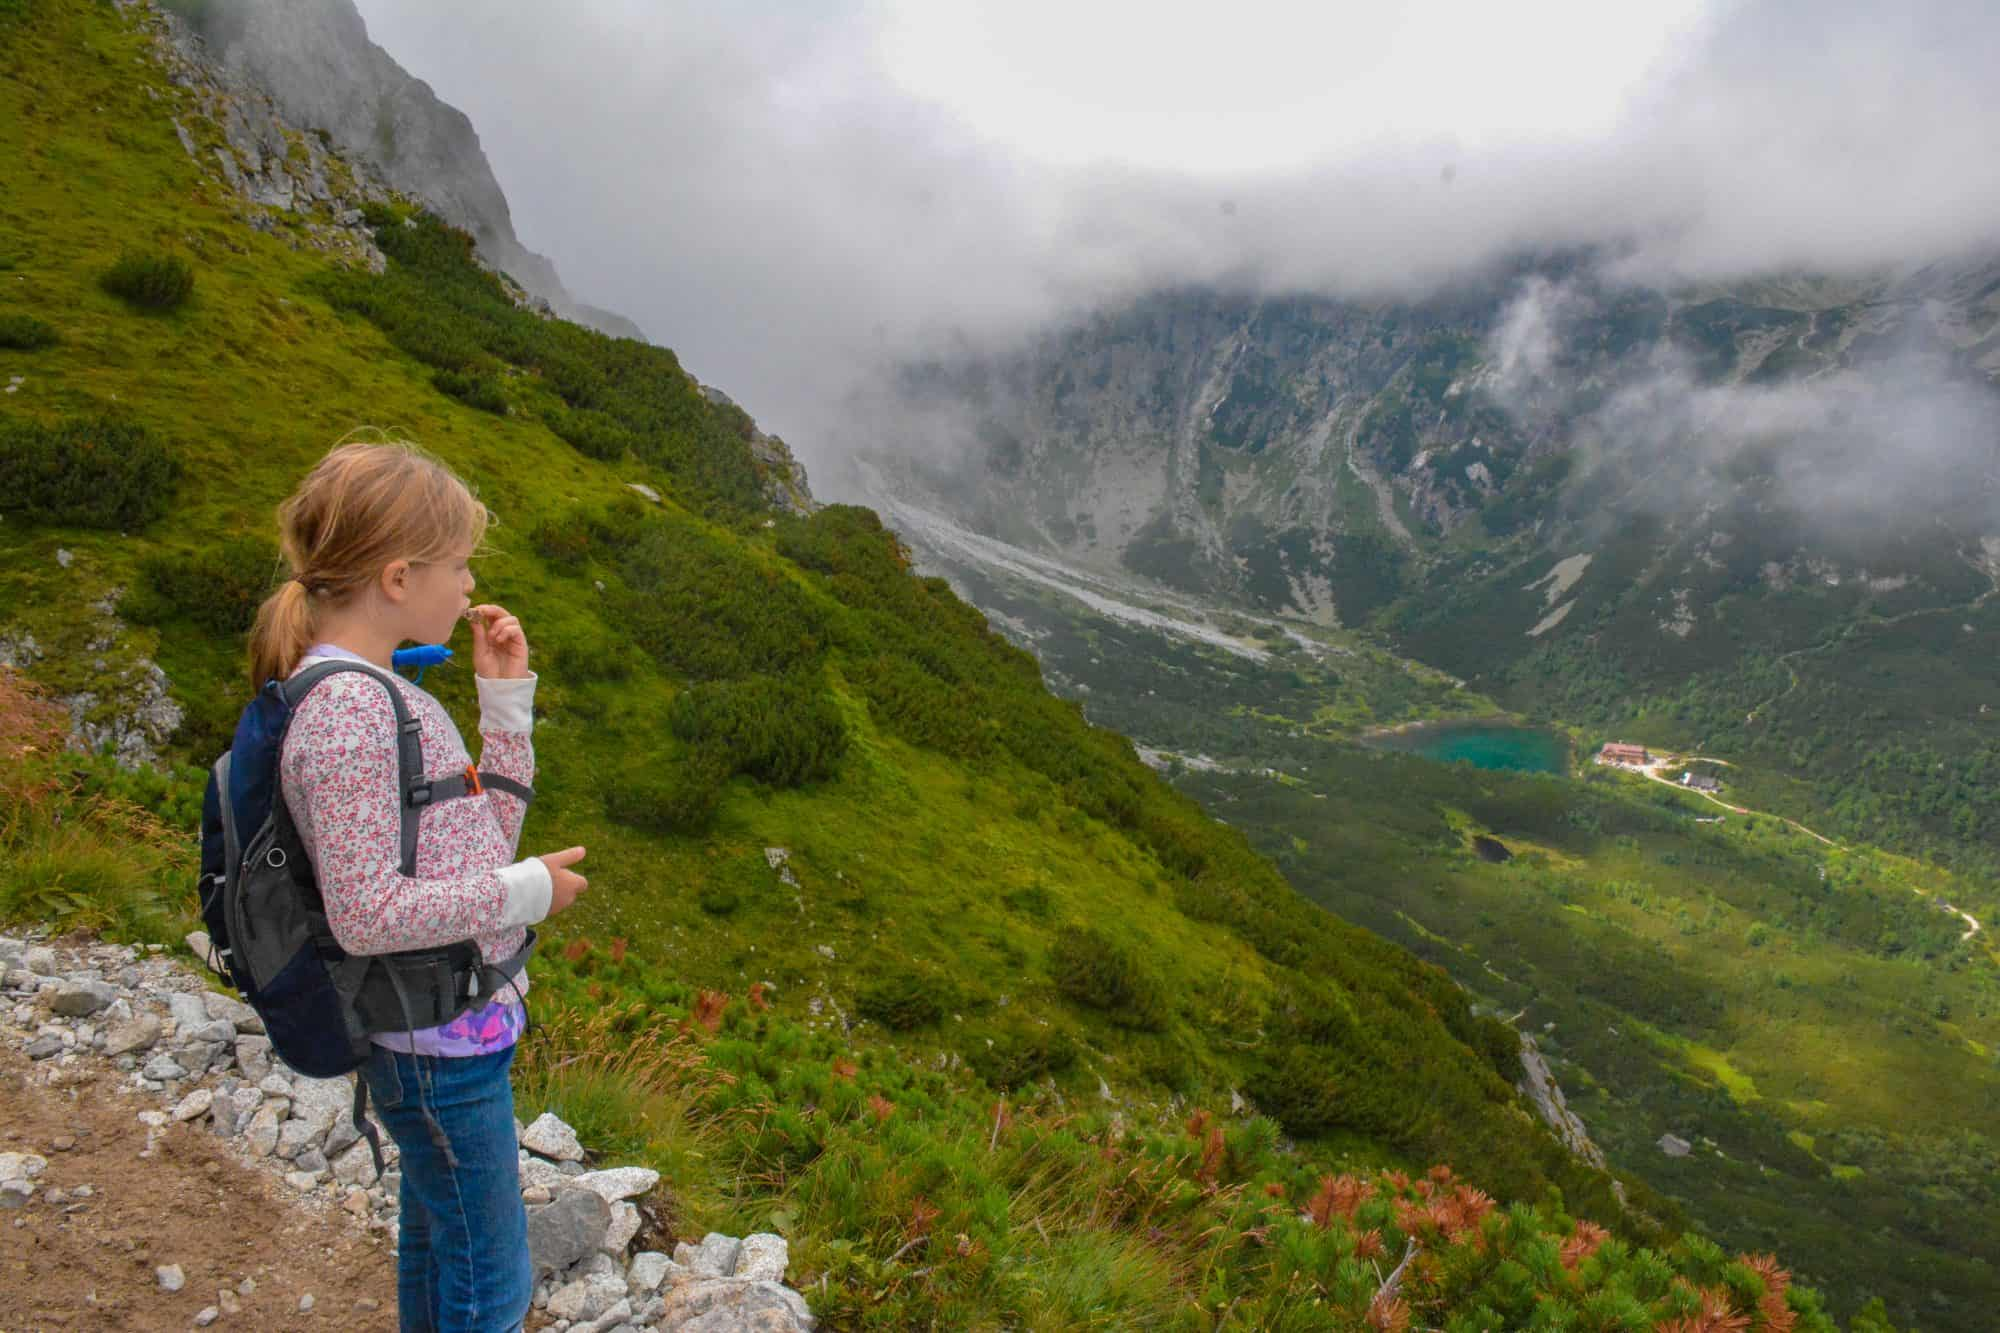 Slovakia Tourism: Go hiking in Slovakia's Tatra Mountains with Your Family